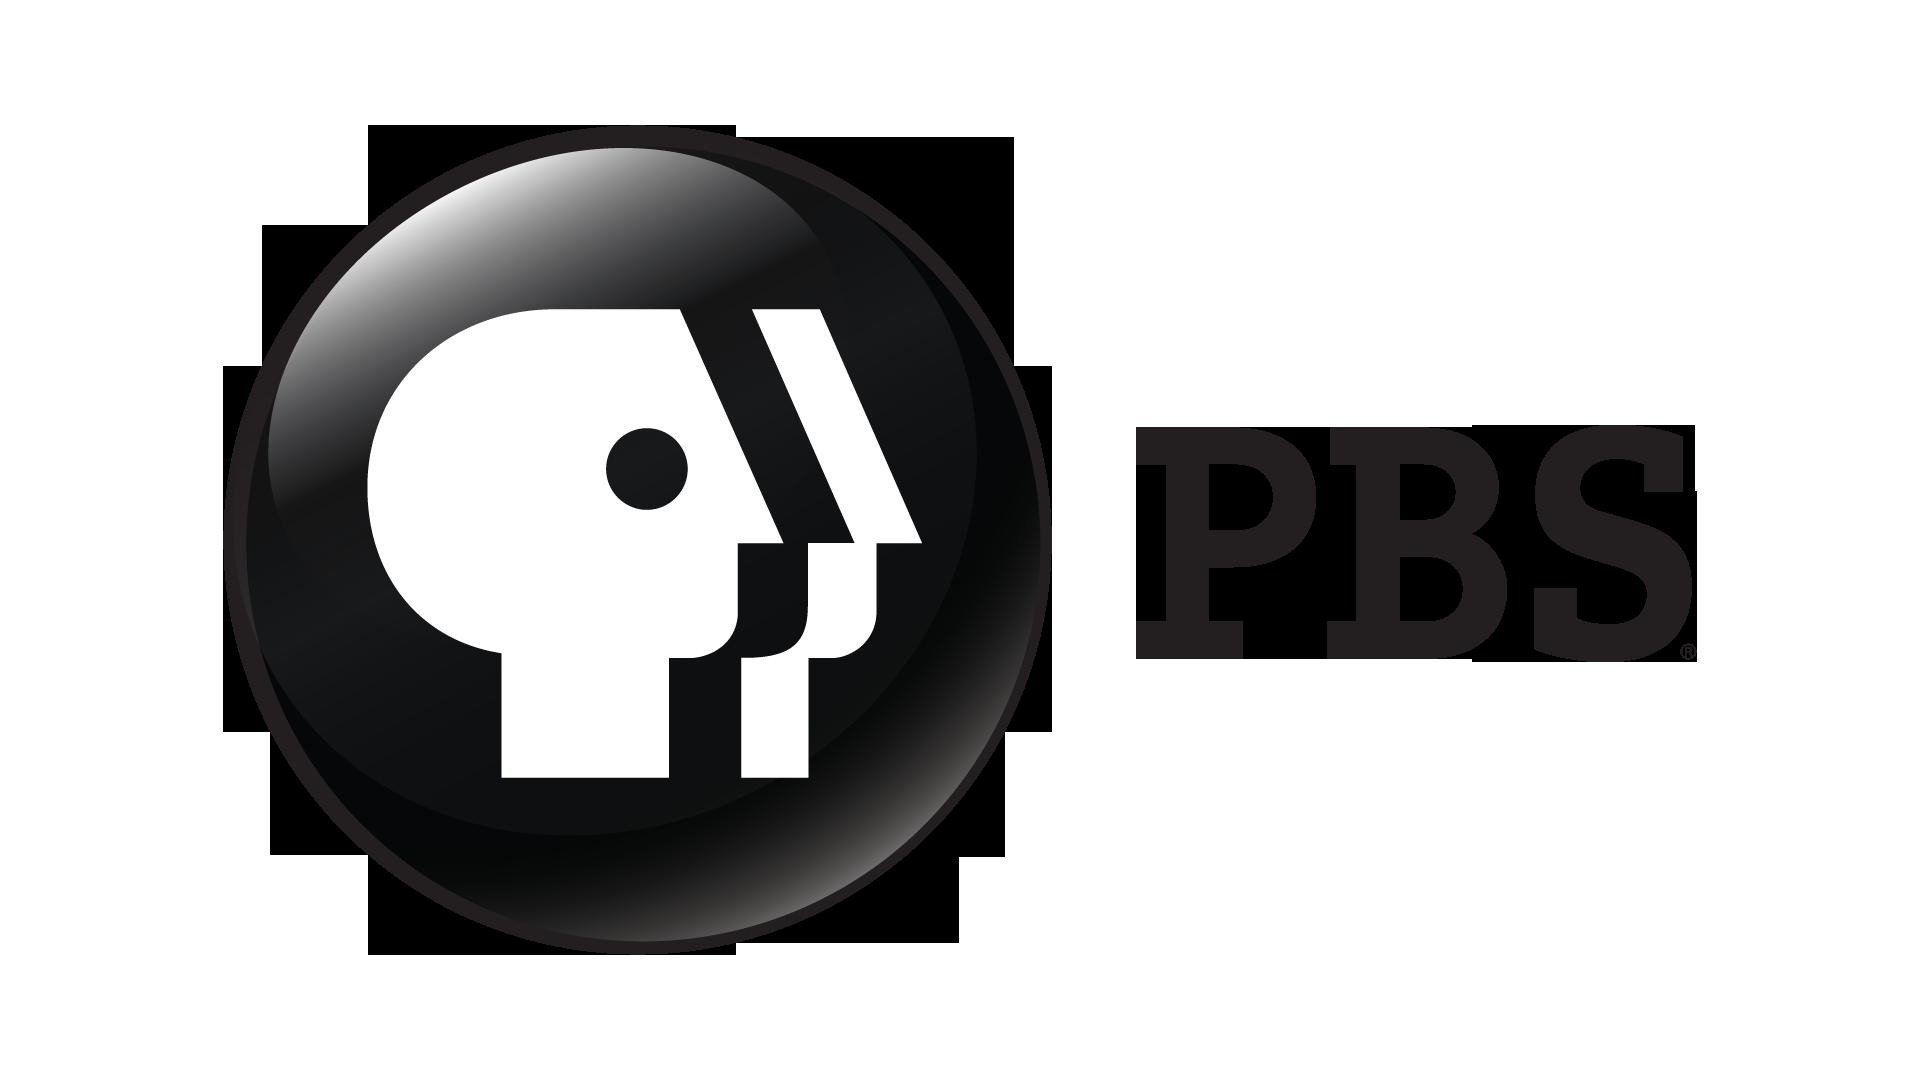 Logo PBS.png